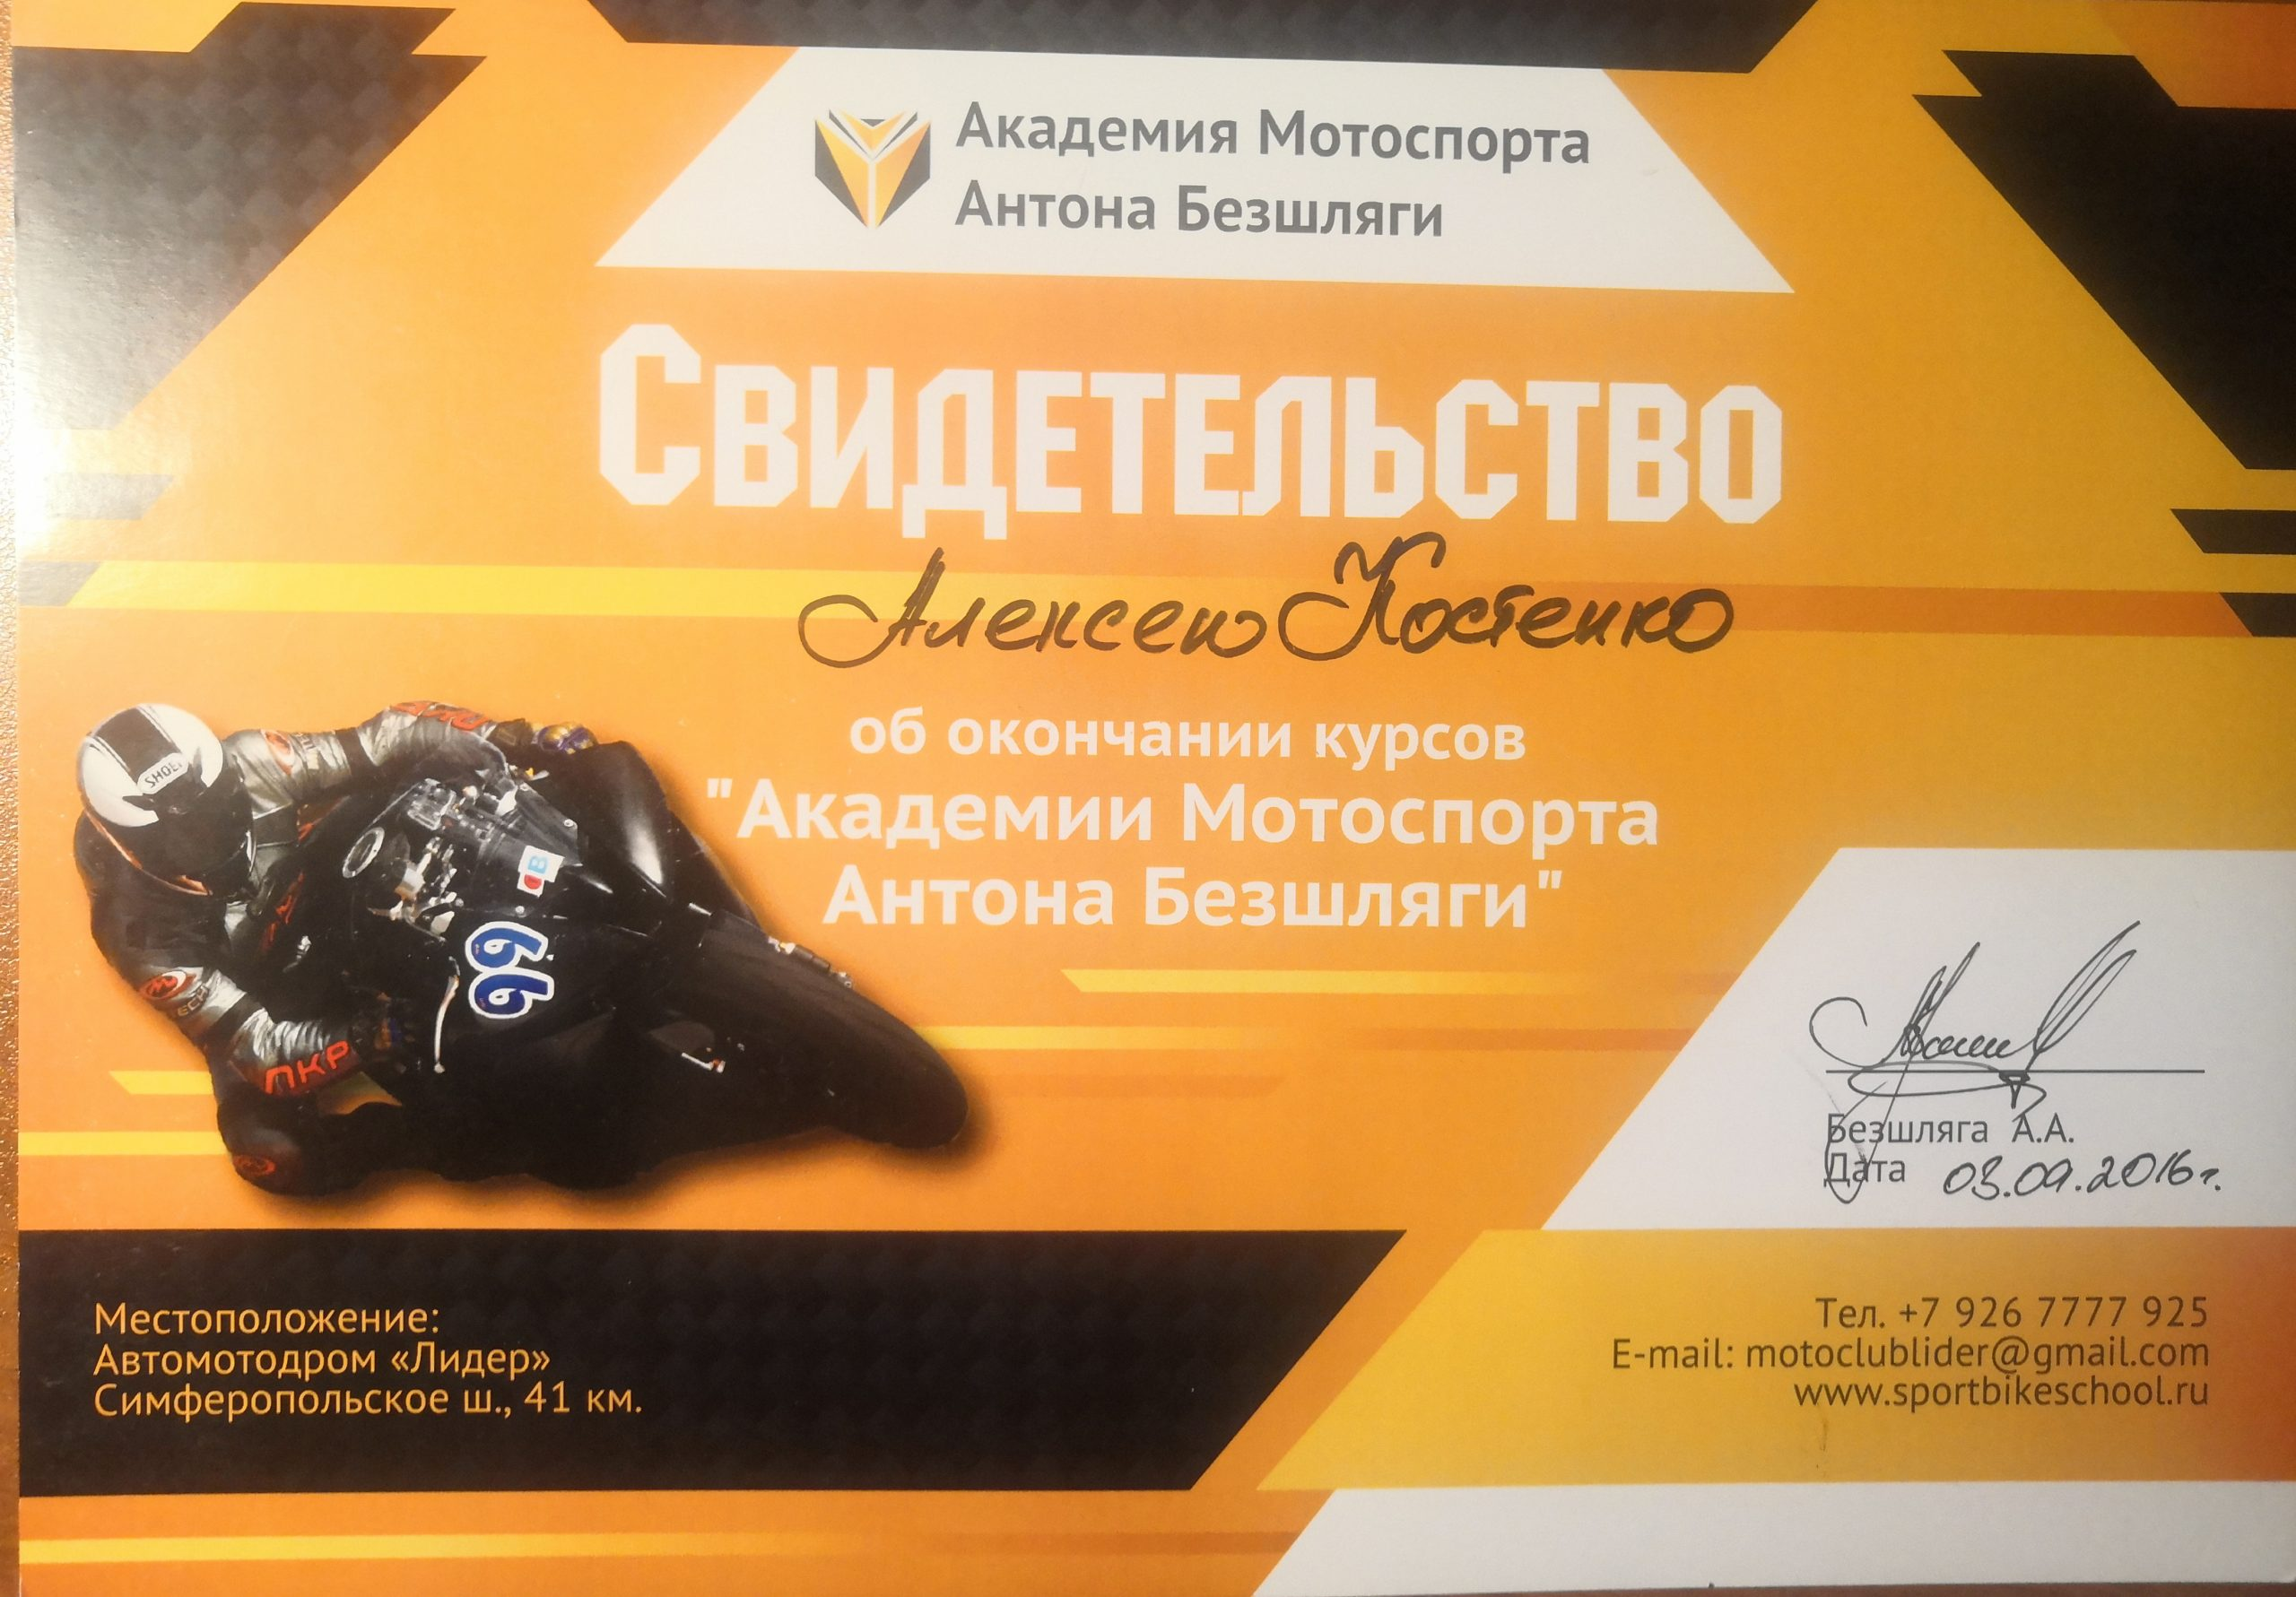 Академия мотоспорта - Алексей Костенко